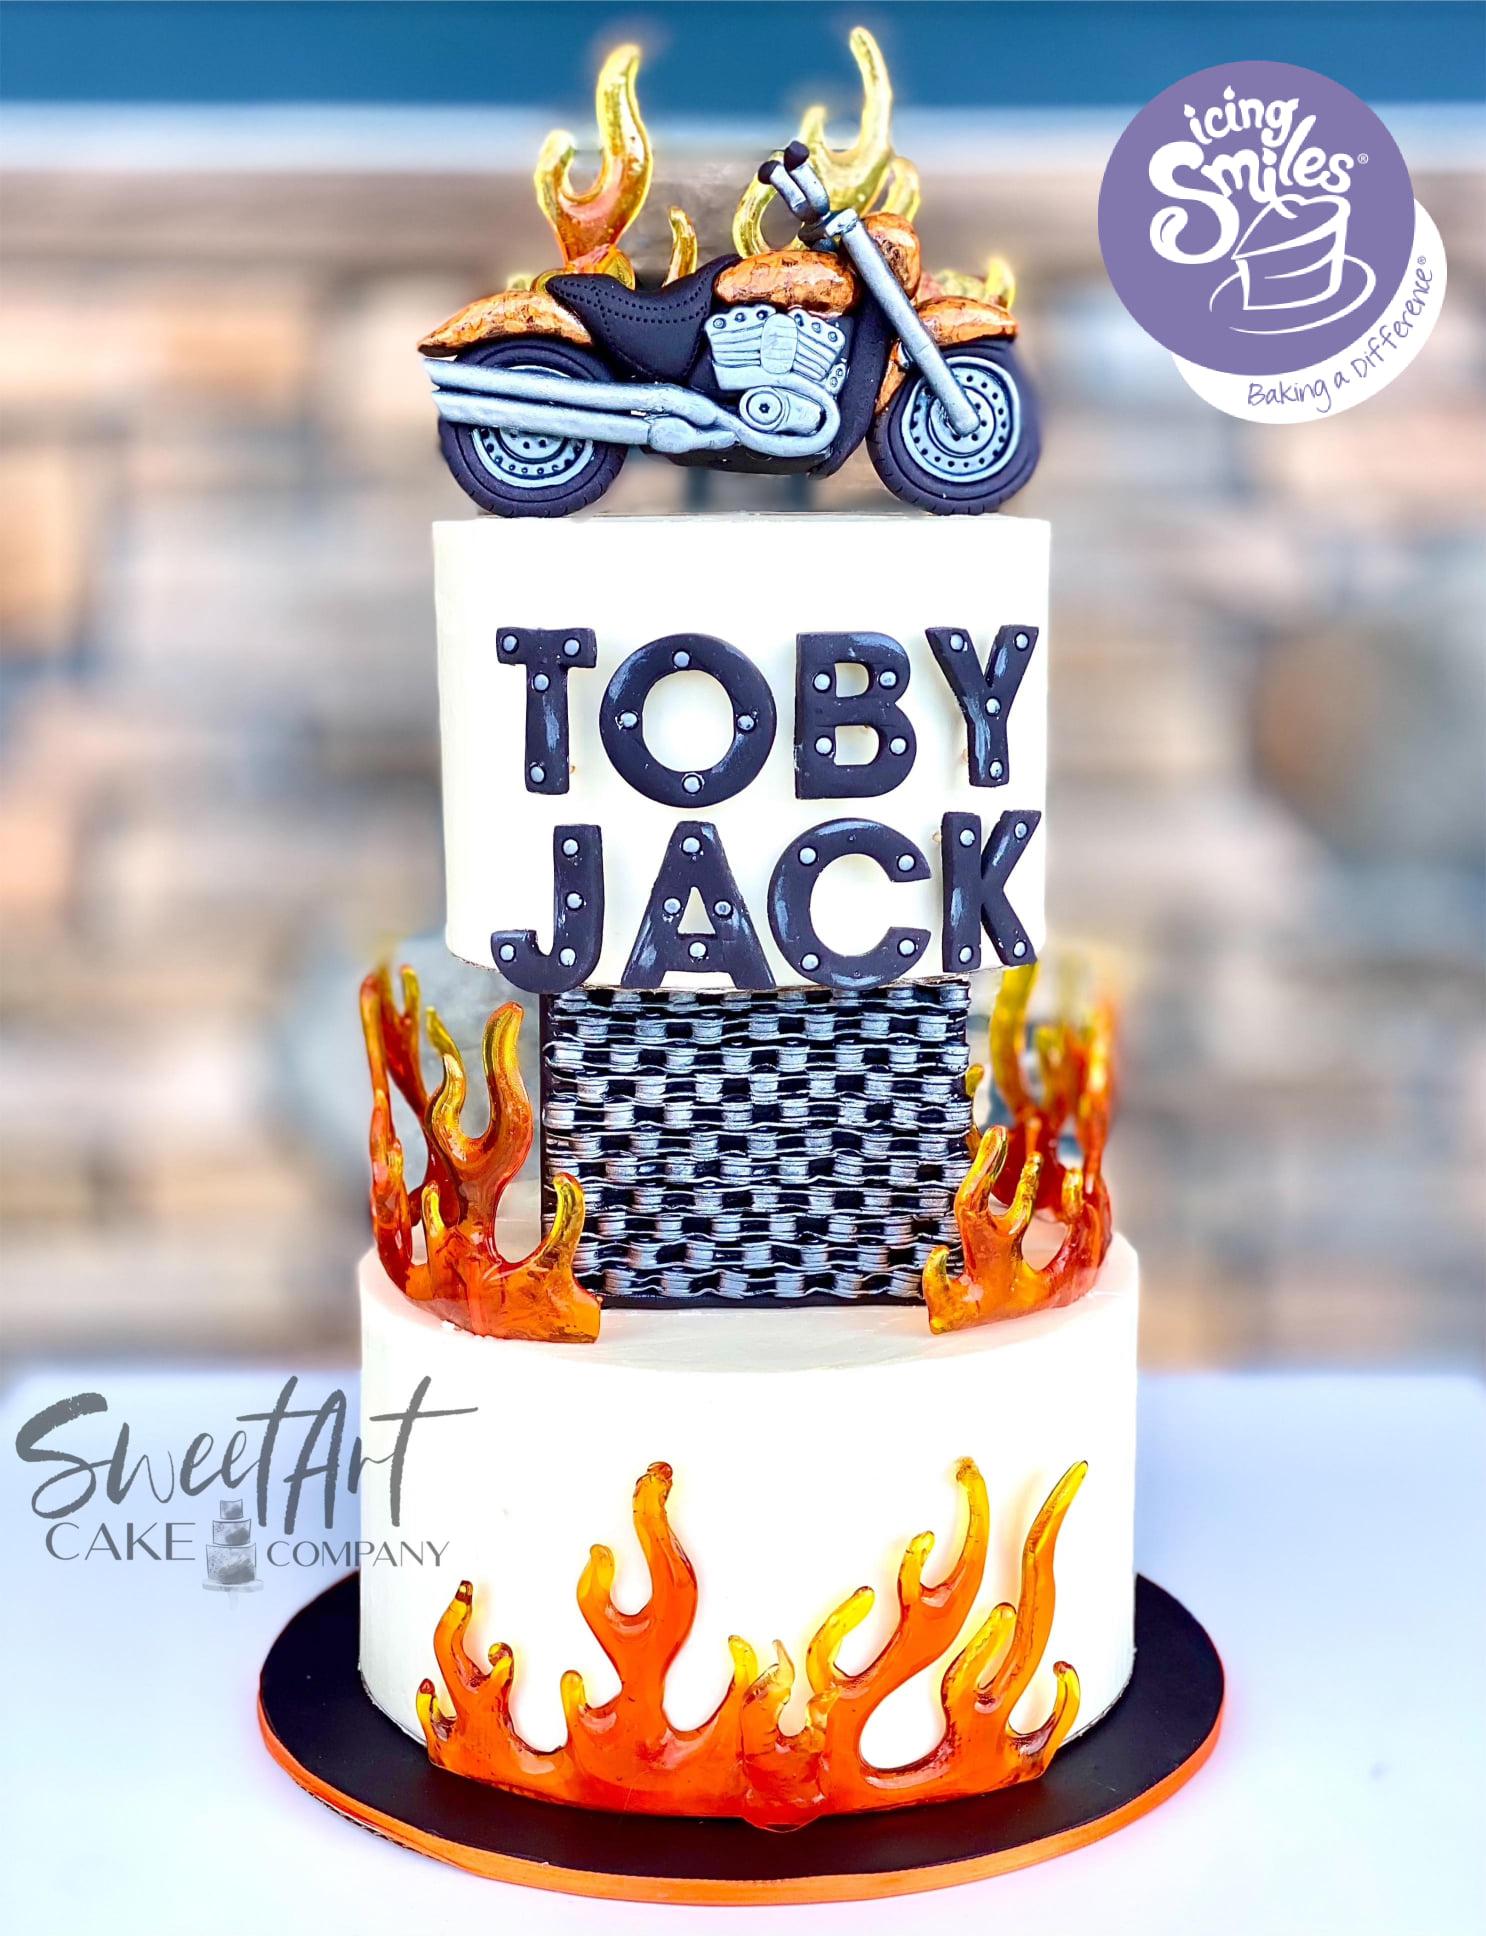 Icing Smiles Motorcycle Cake